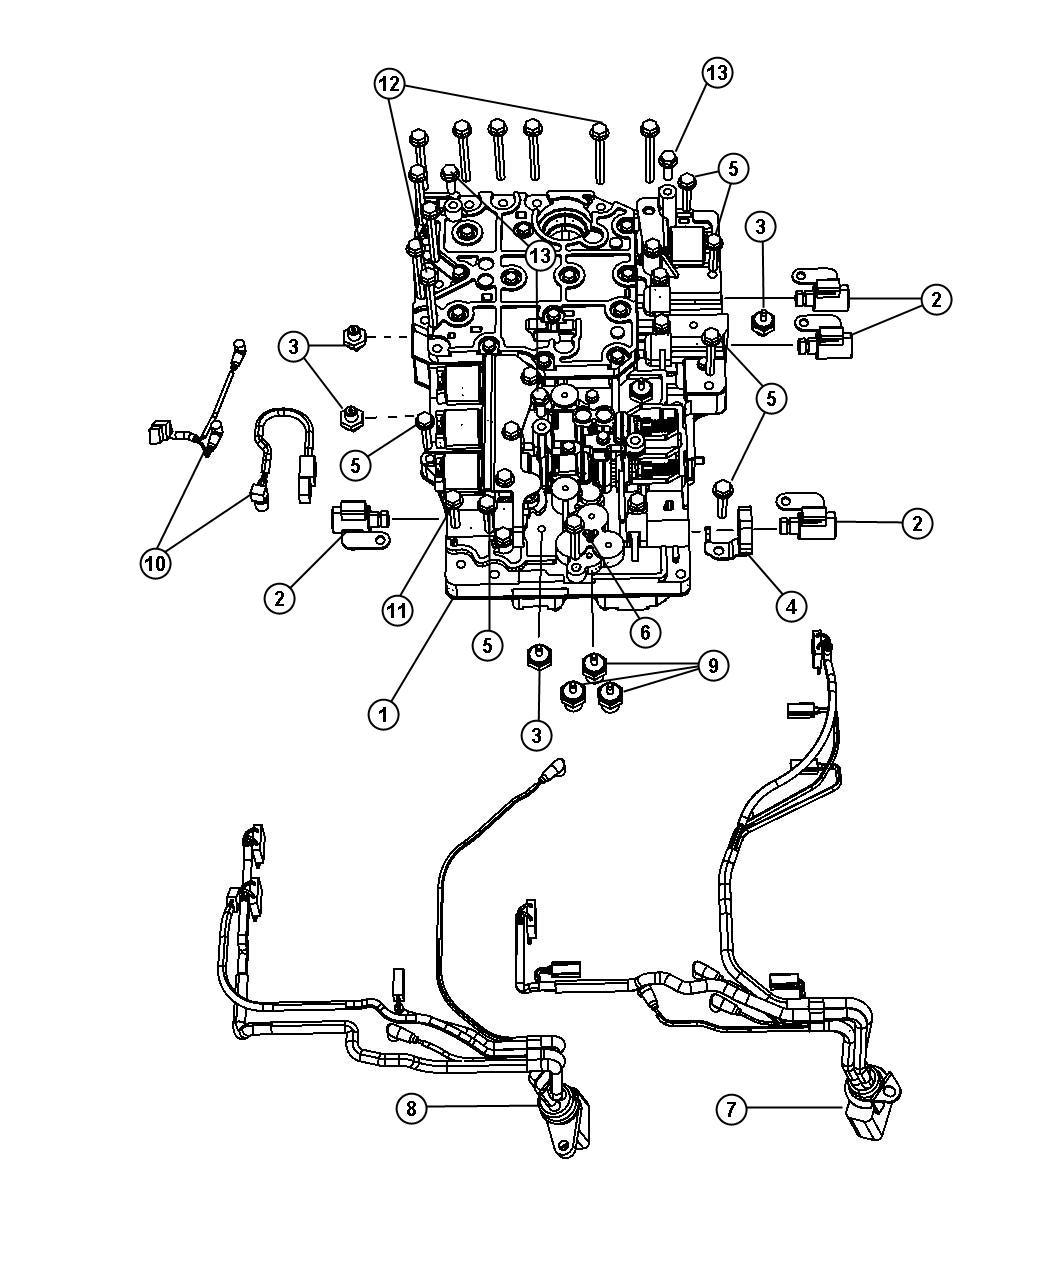 Dodge Ram Harness Wiring Transmission 10 Pin